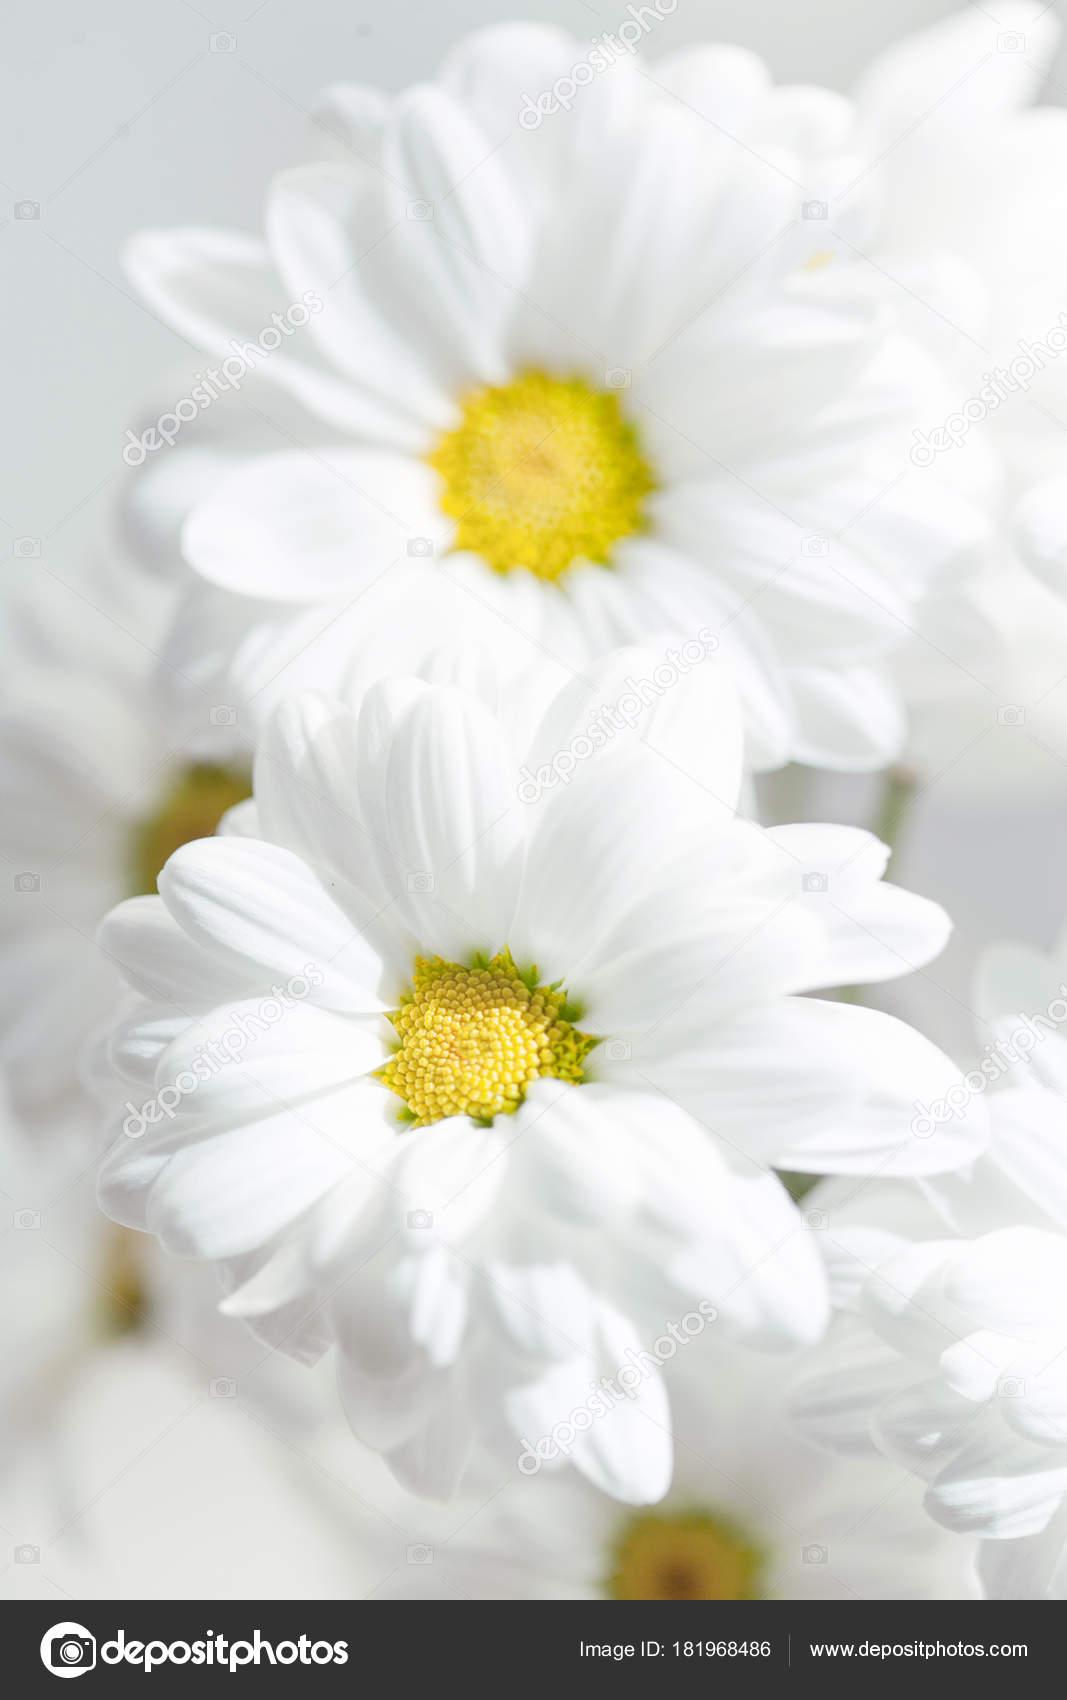 Spring flowers wallpaper white gerbera flower daisy flower grey spring flowers wallpaper white gerbera flower daisy flower grey background stock photo mightylinksfo Choice Image